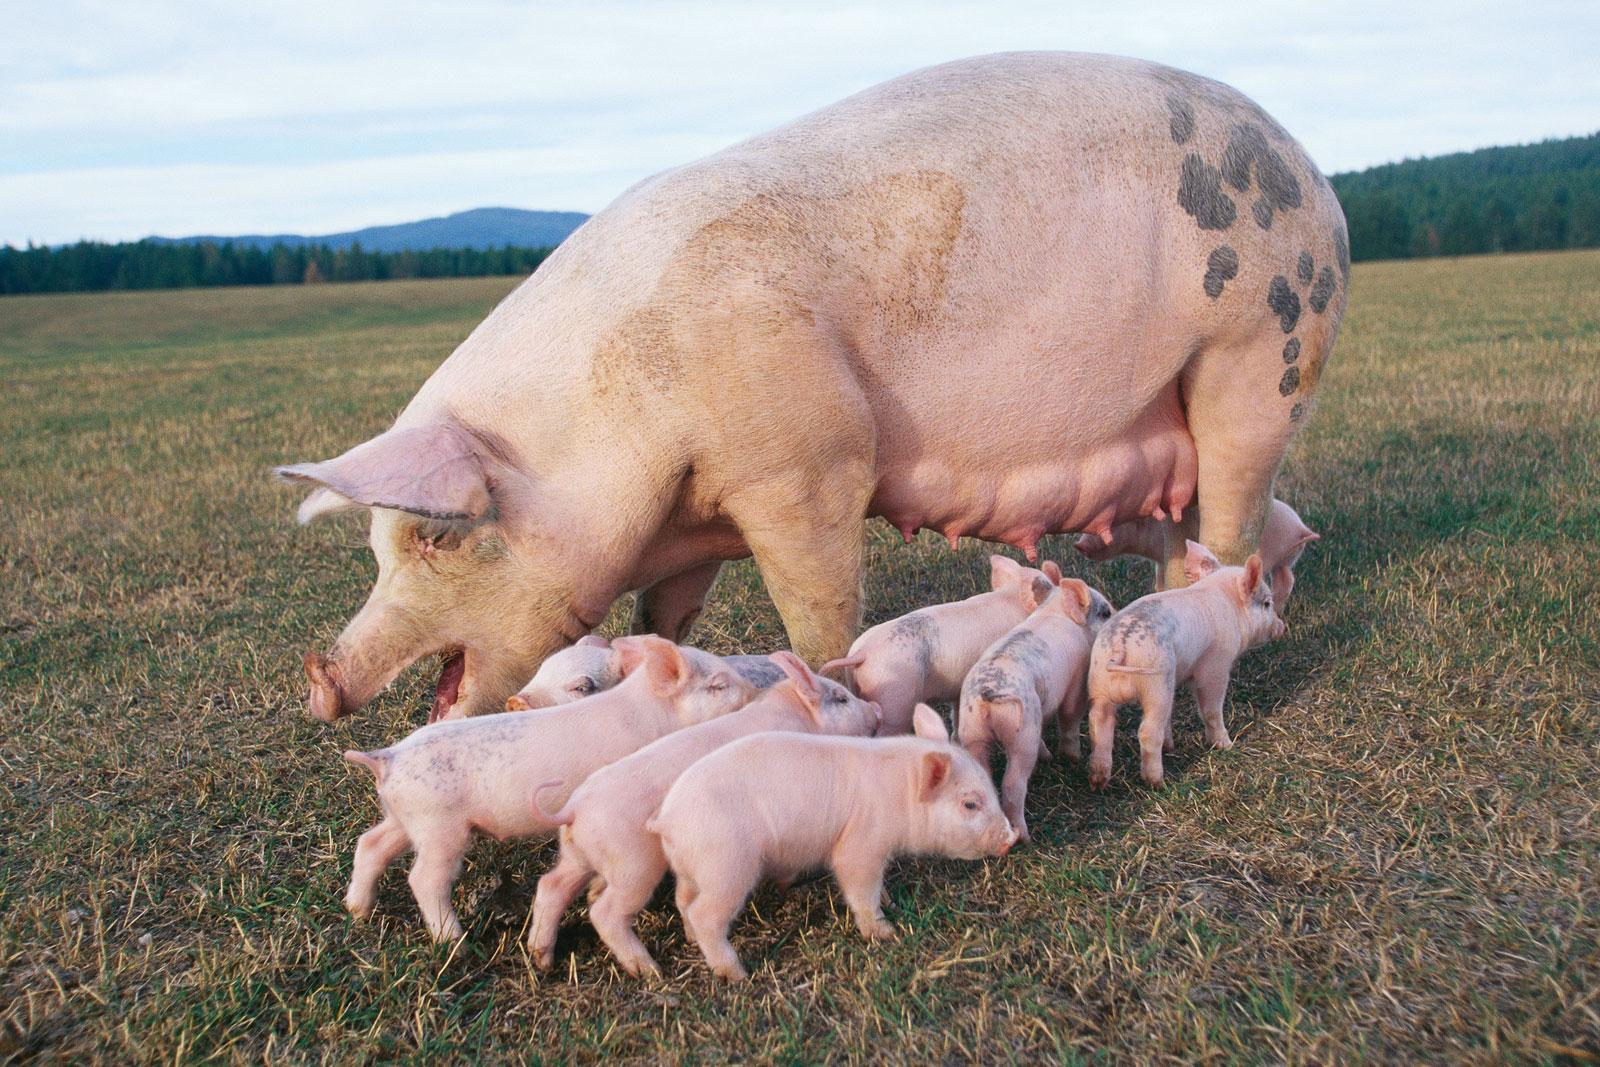 Pin Pigs Couple Hd Wallpaper Placecom HD Wallpaper Image 1600x1067